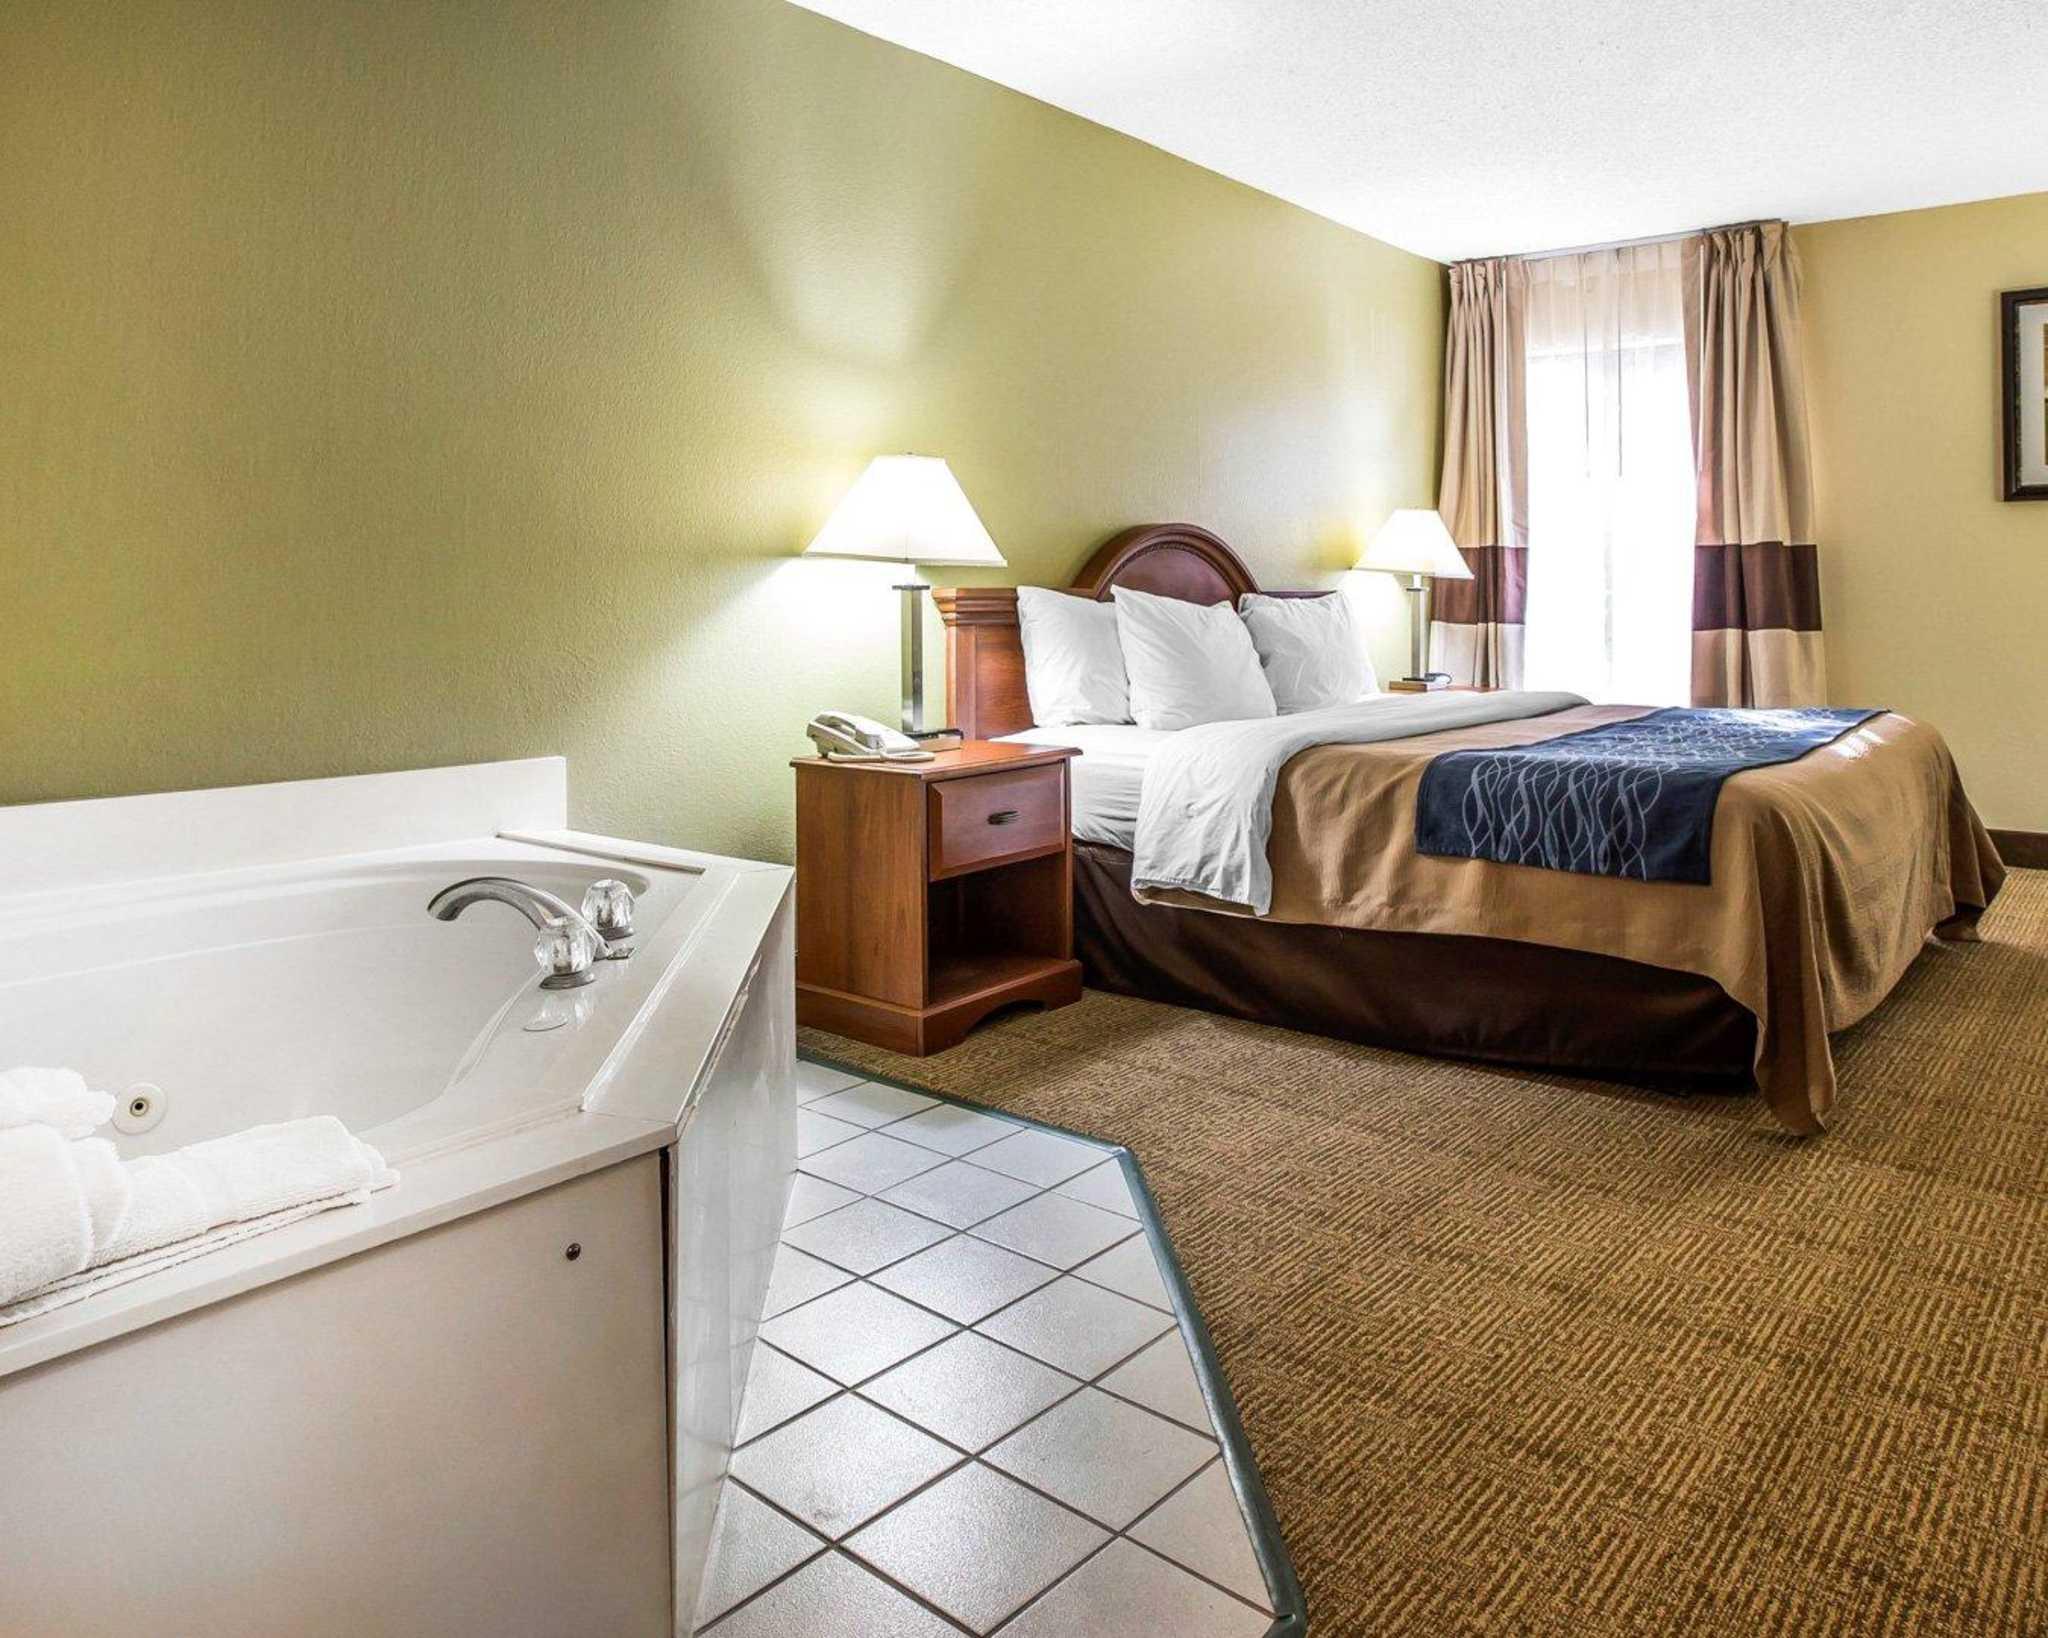 Quality Inn Darien-North Brunswick image 24